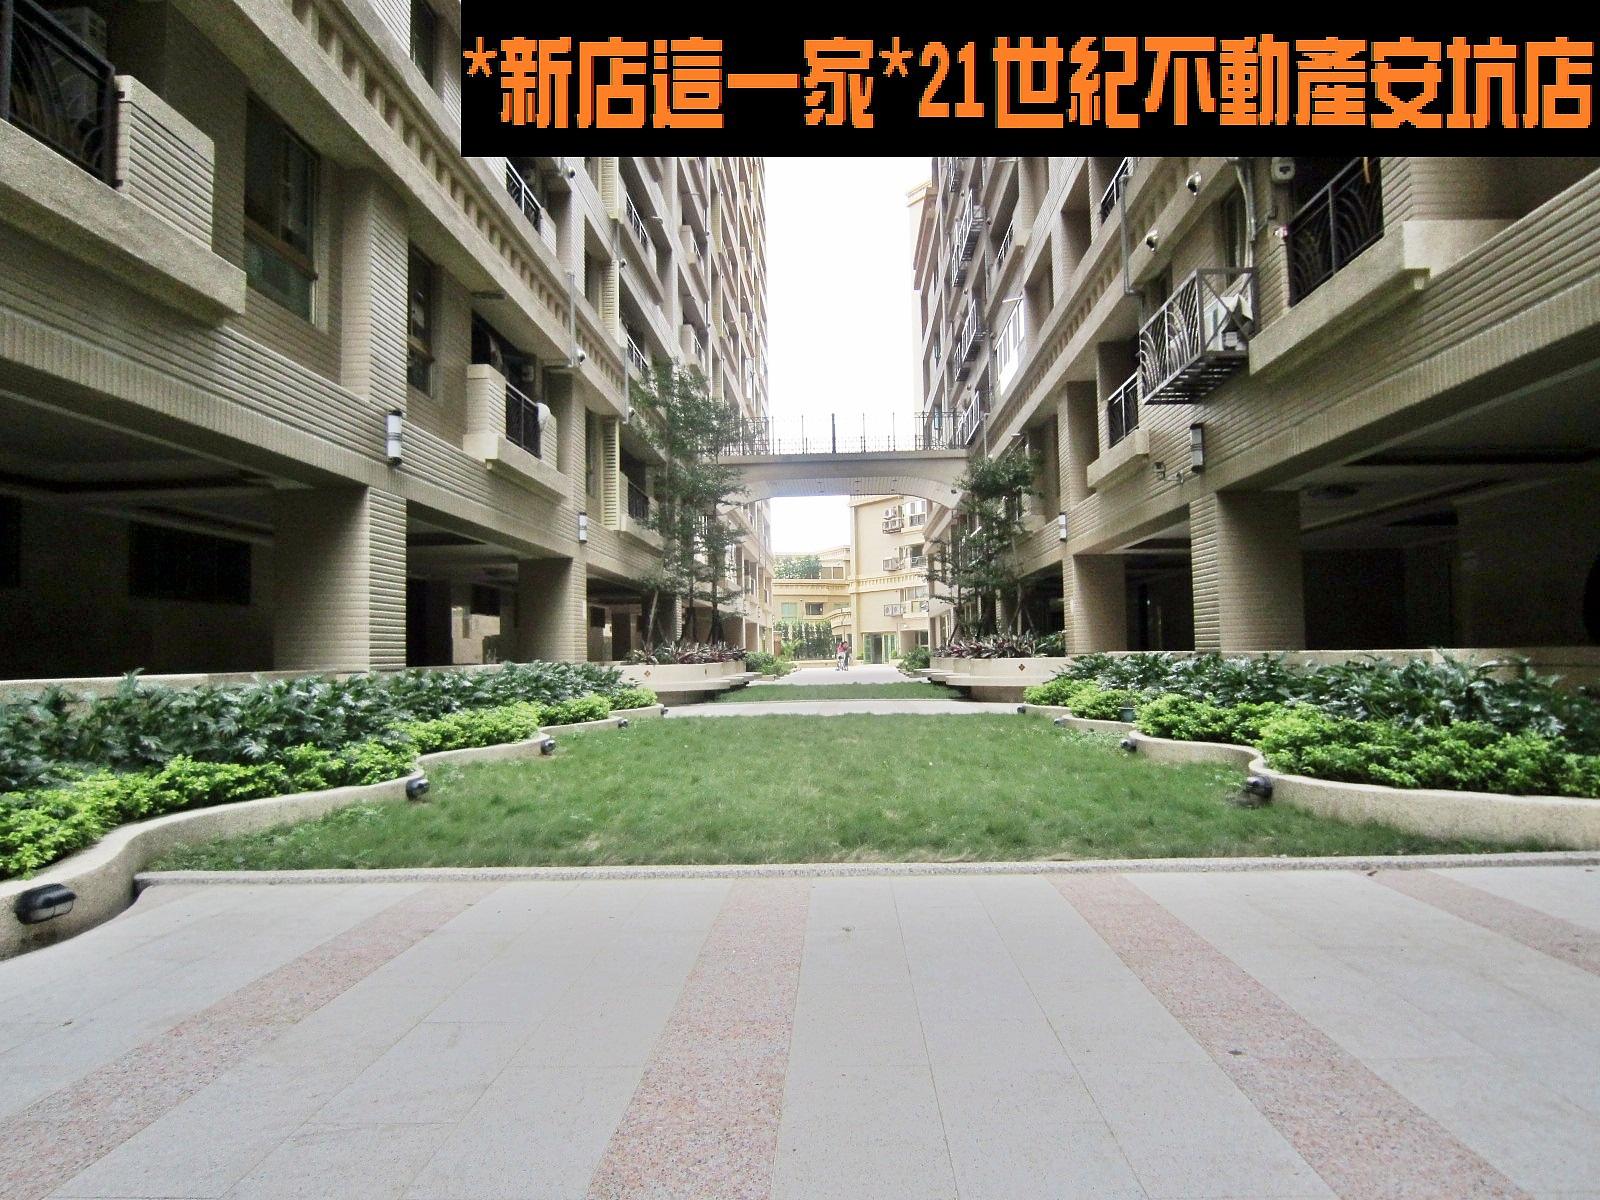 21city-5.jpg